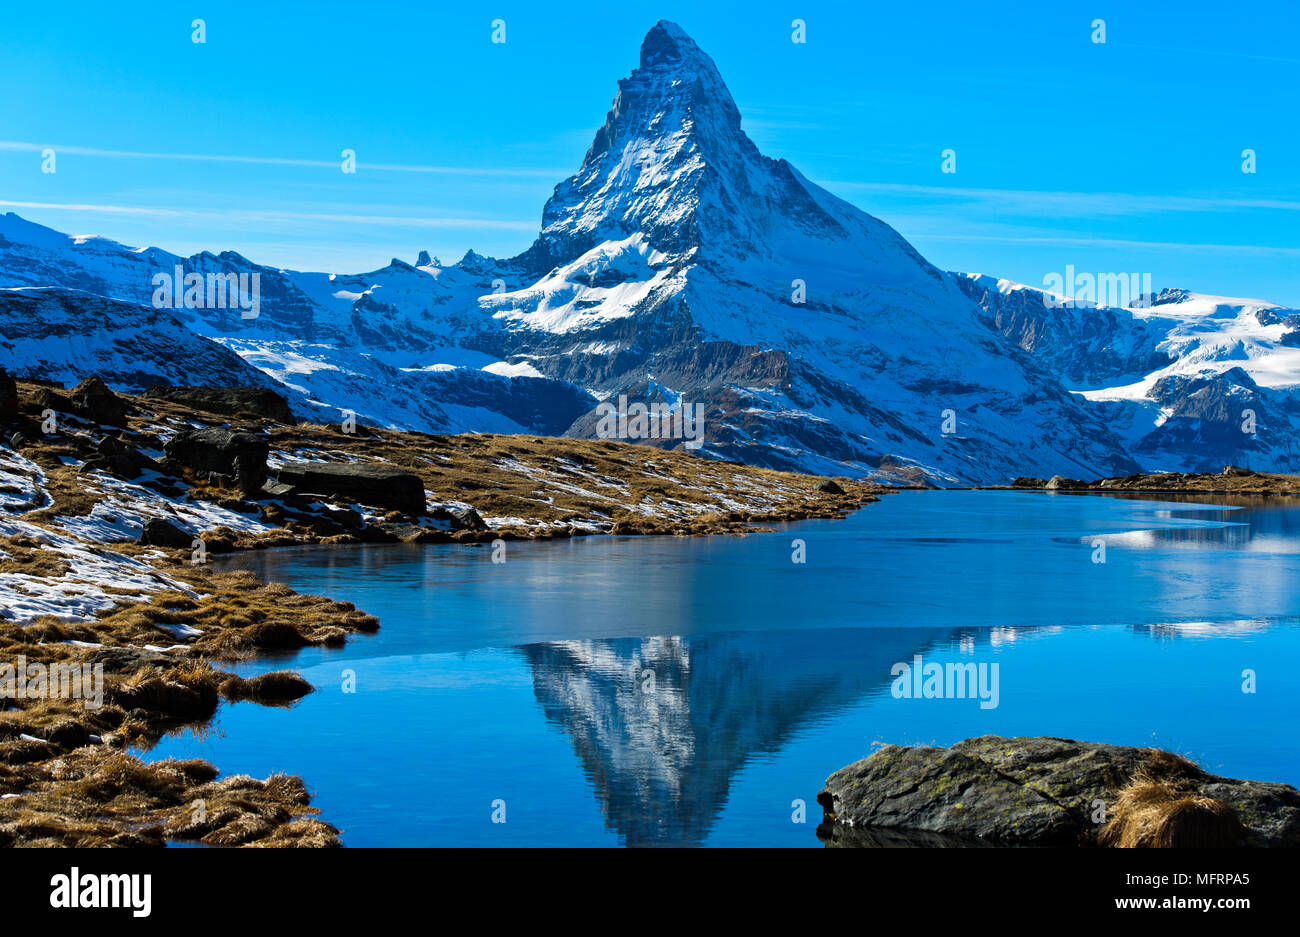 Snowy Matterhorn reflected in the partly frozen Stellisee, Zermatt, Valais, Switzerland - Stock Image